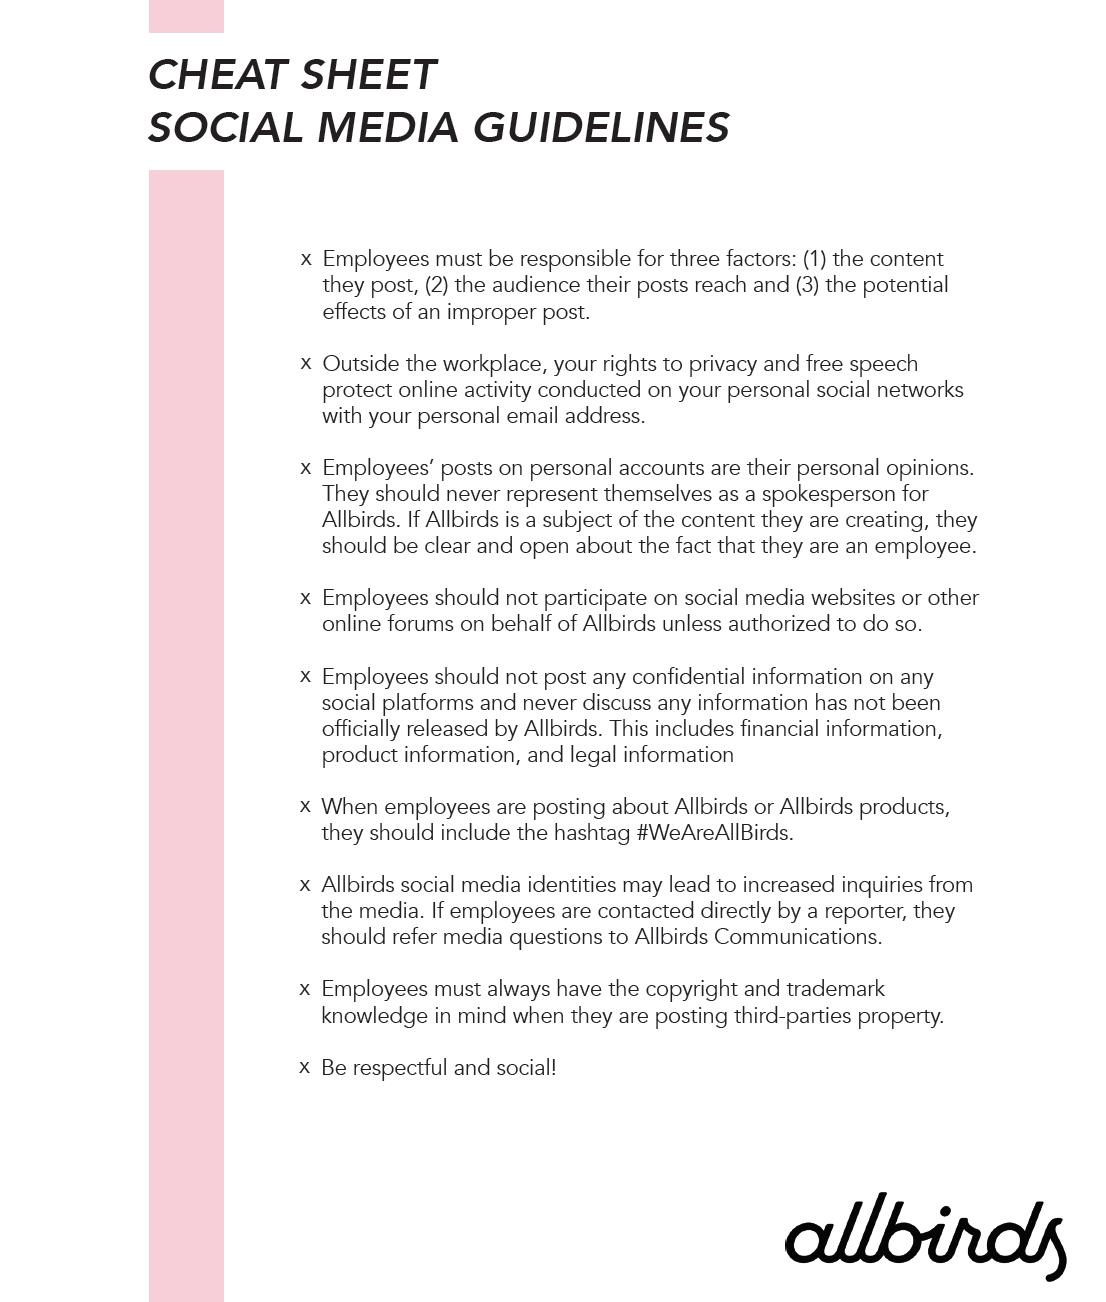 social_media_guidelines